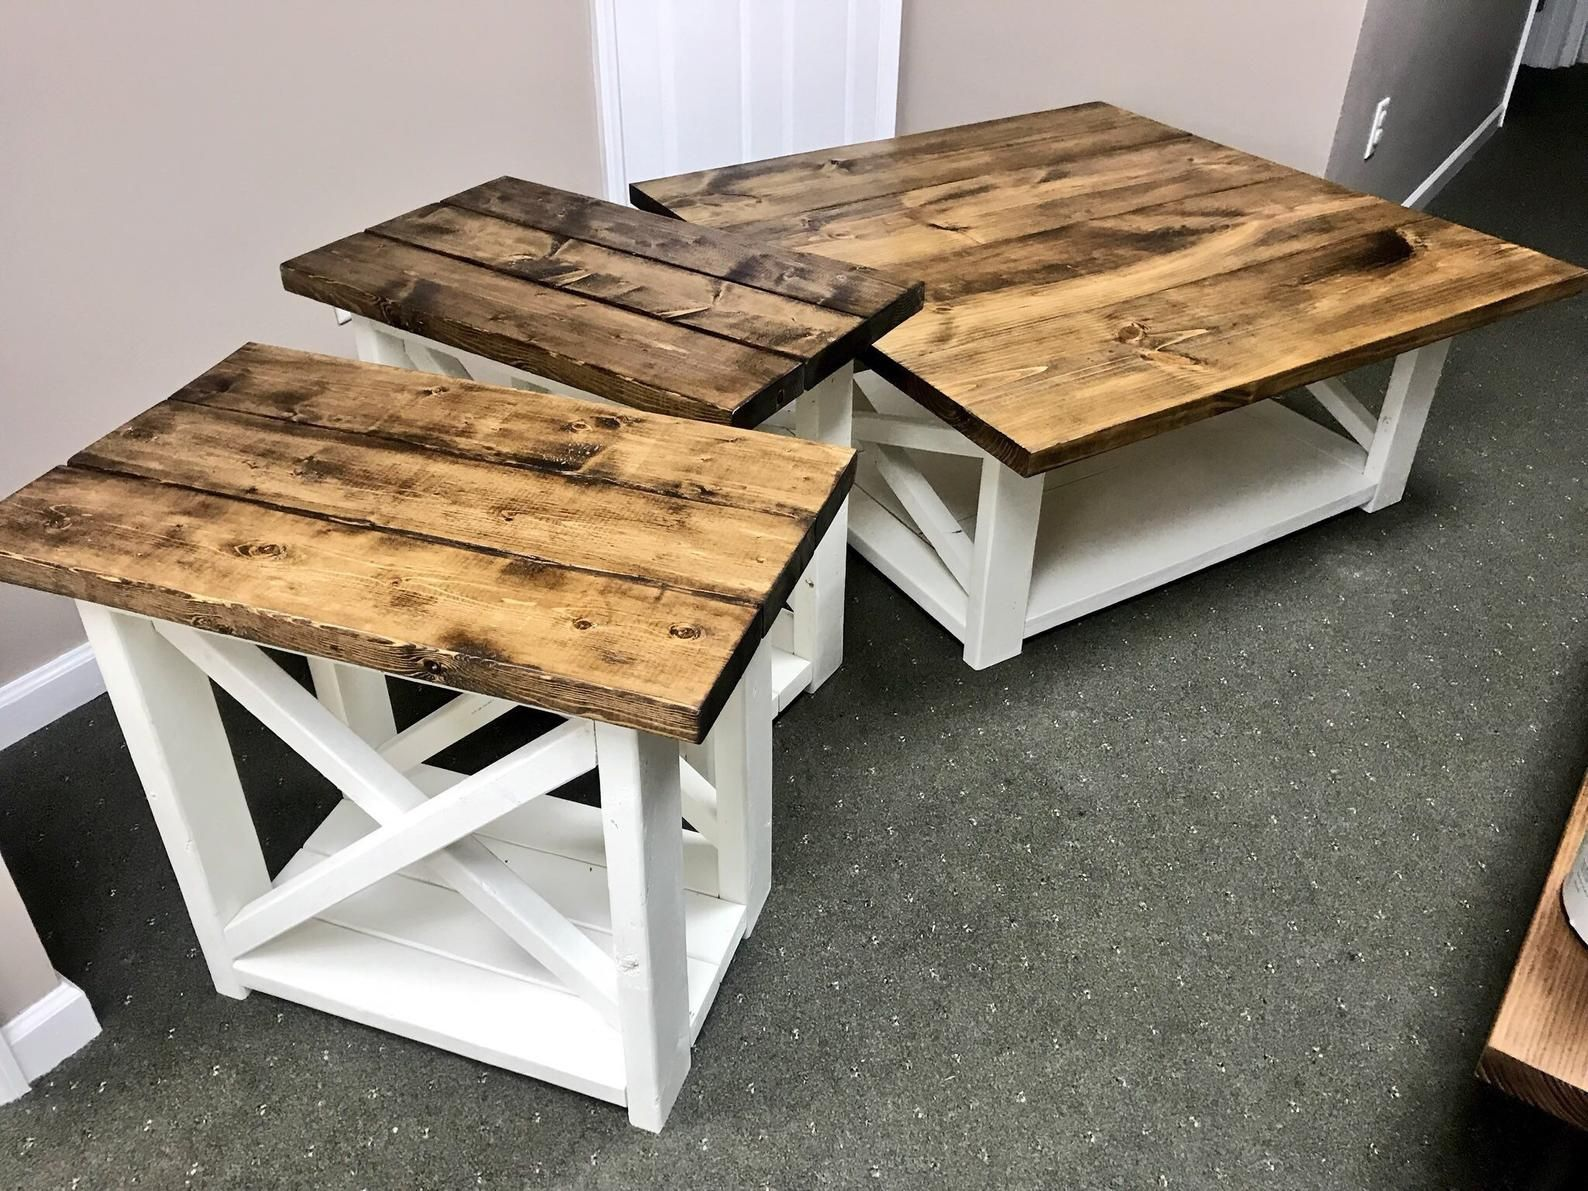 Rustic Living Room Set Large Farmhouse Coffee Table With Set Etsy Coffee Table Farmhouse Coffee Table Wood Wood Coffee Table Rustic